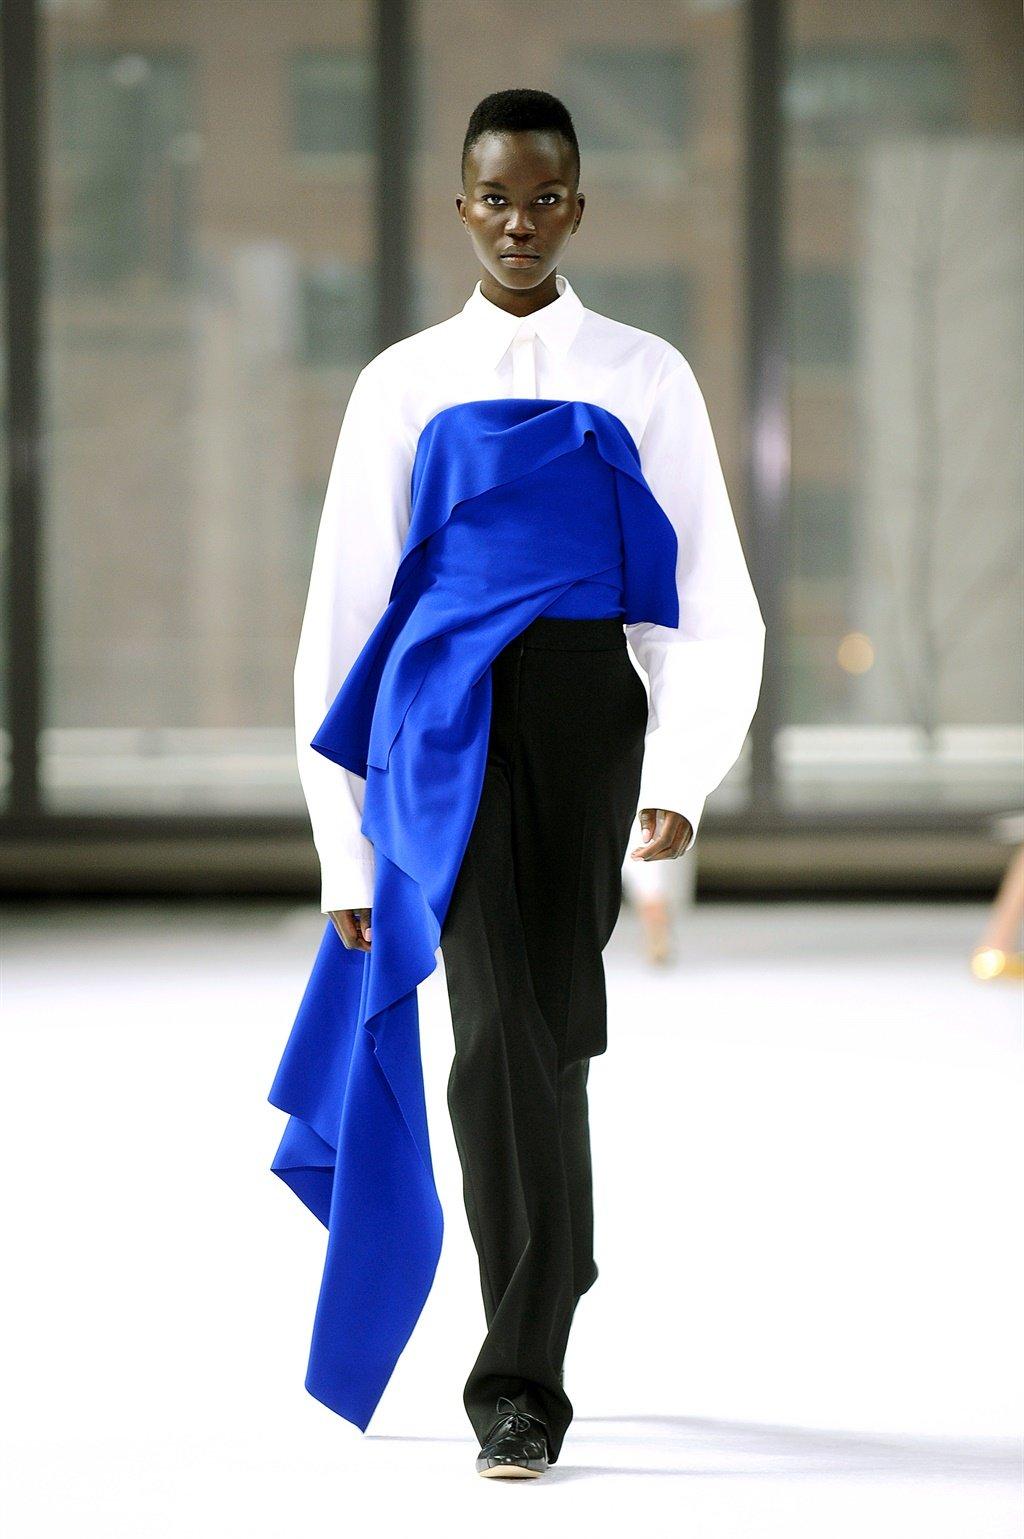 NEW YORK, NEW YORK - FEBRUARY 10: A model walks th